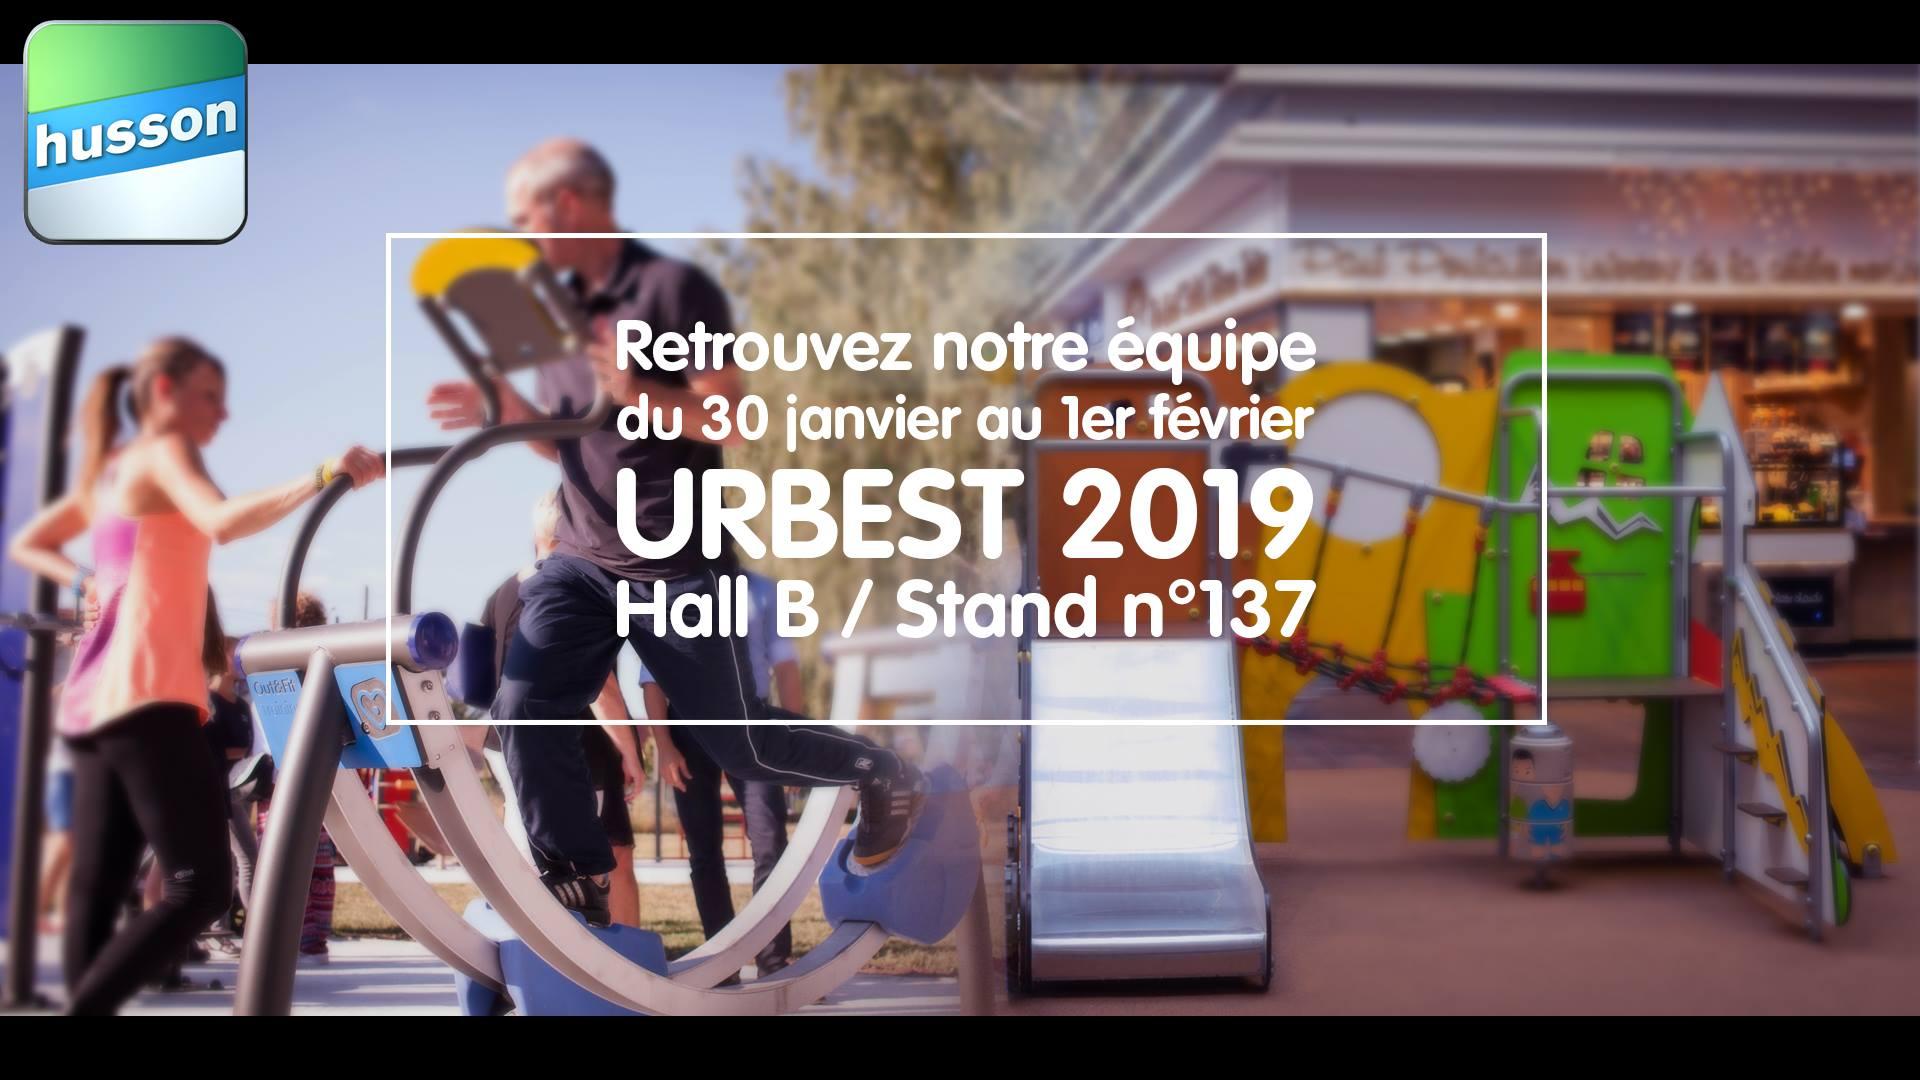 urbest-husson-2019